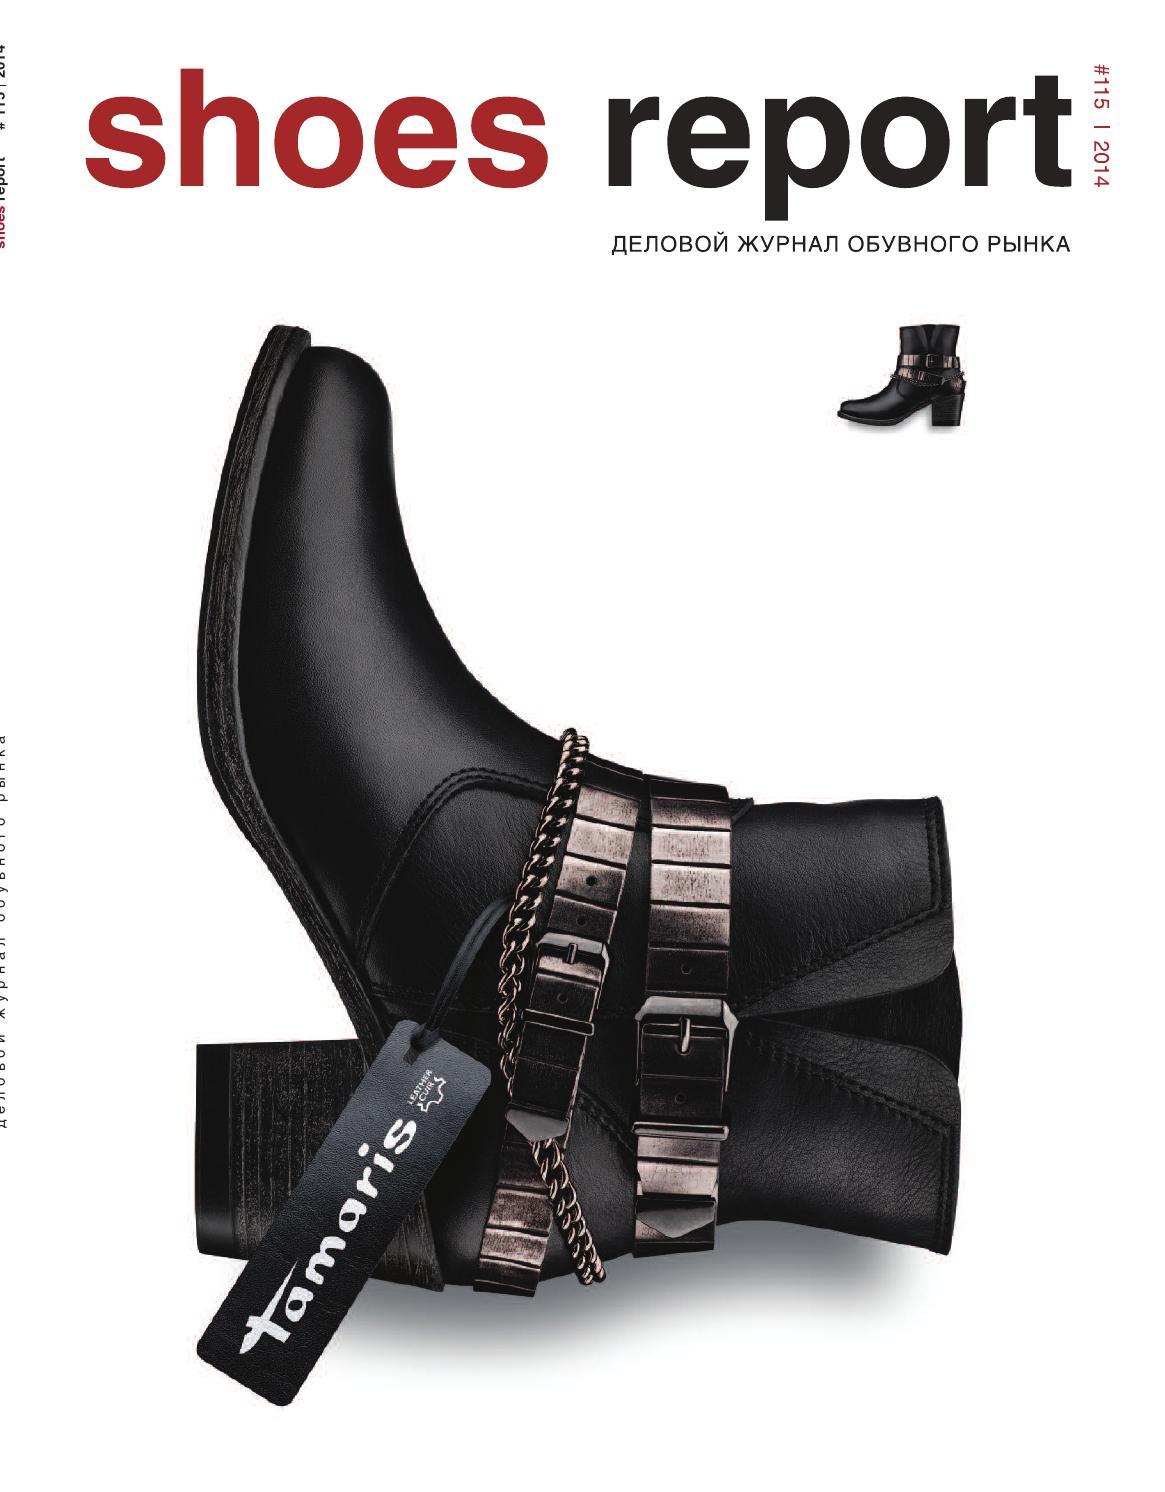 2fd86d29d169 Shoes Report  115, февраль 2014 by Olga Sevastyanova - issuu